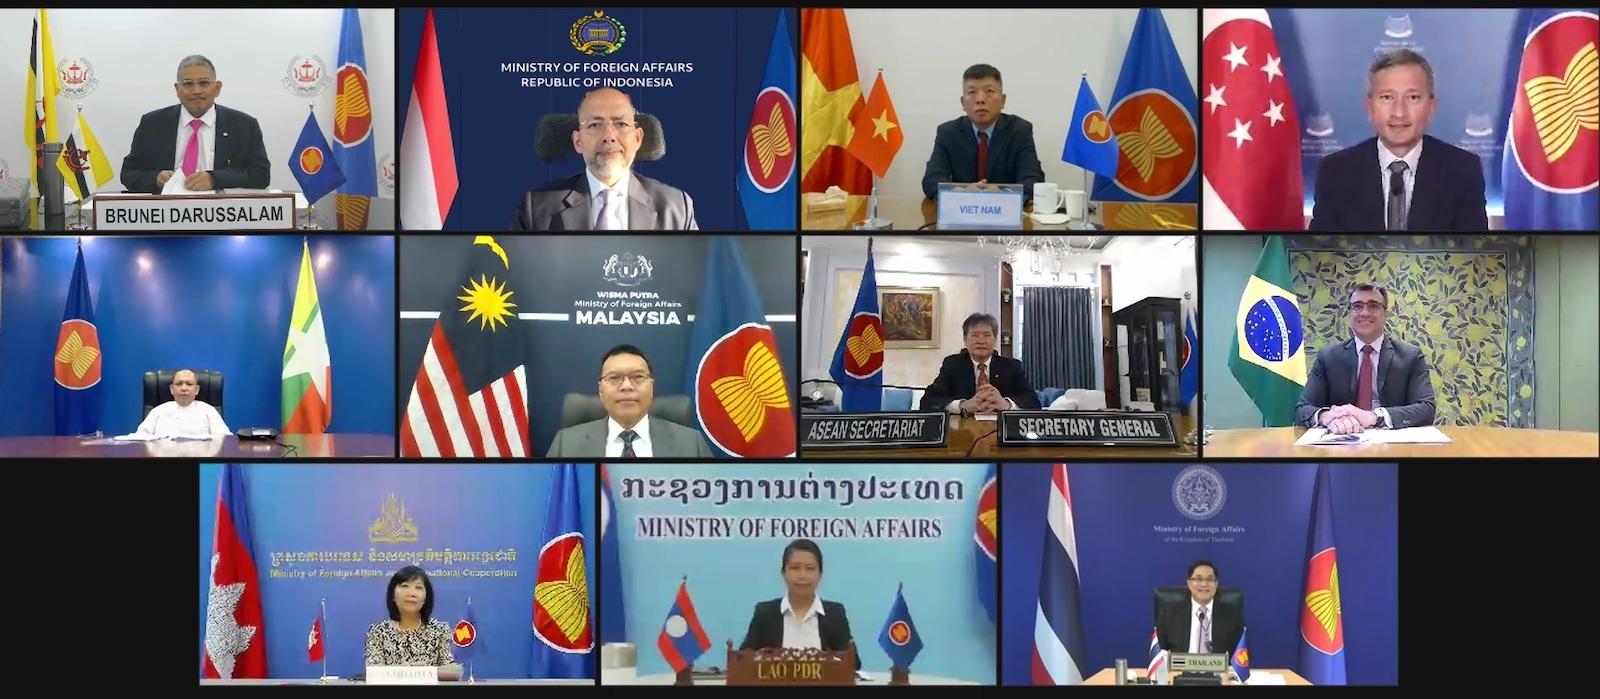 A screenshot of the ASEAN Brazil Open Ended Trioka Dialogue in August (Ministério das Relações Exteriores/Flickr)